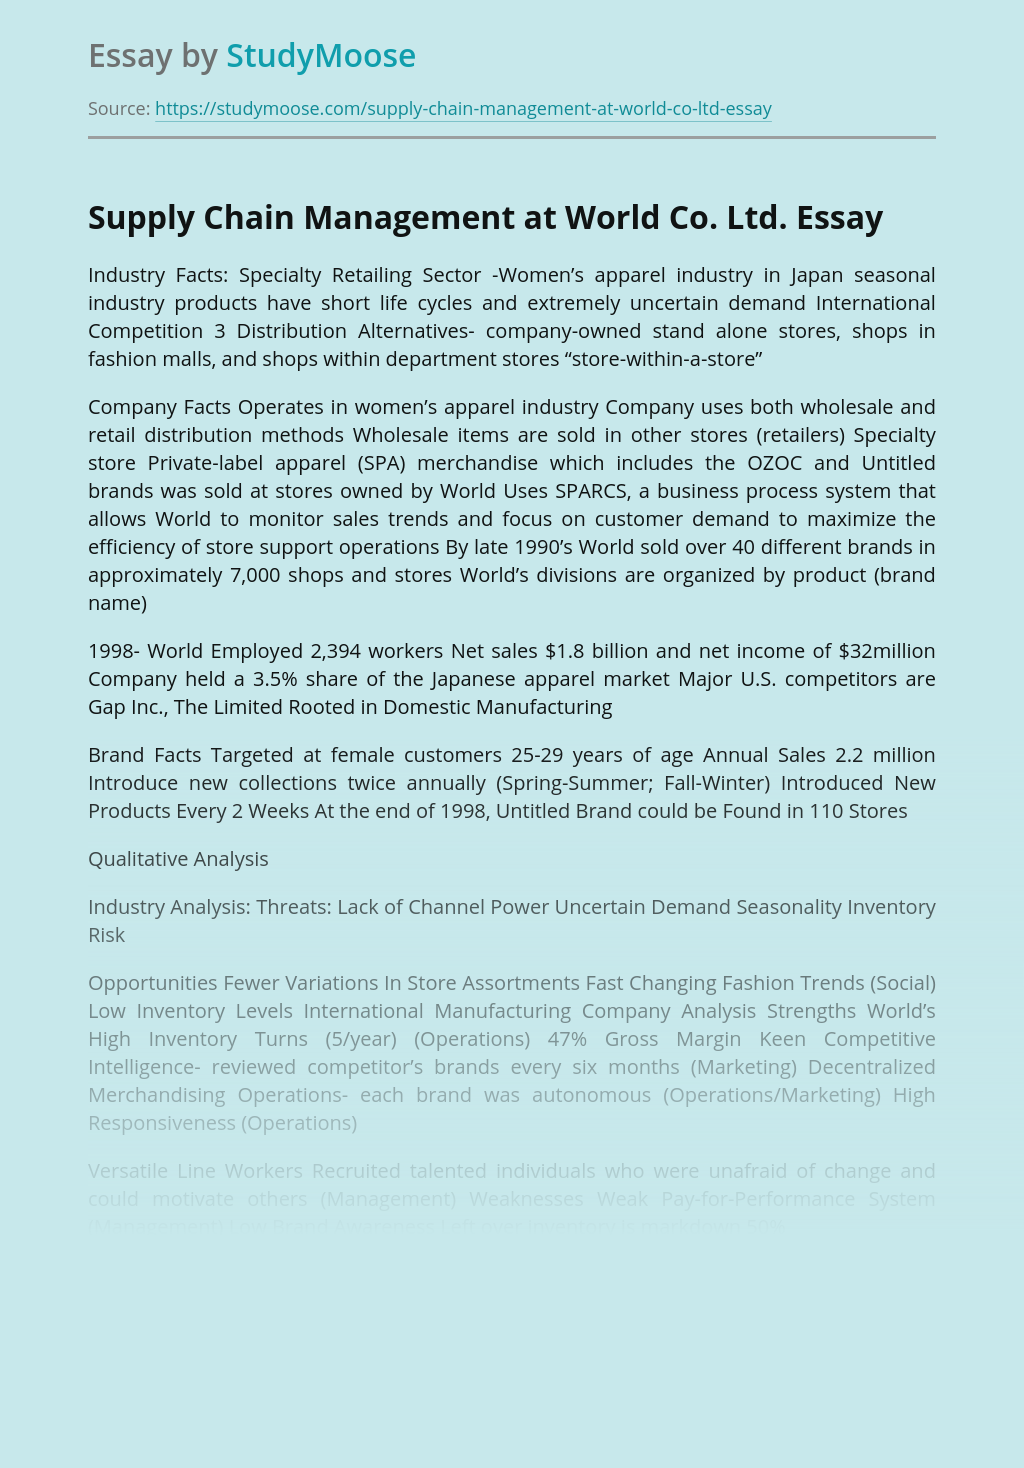 Supply Chain Management at World Co. Ltd.